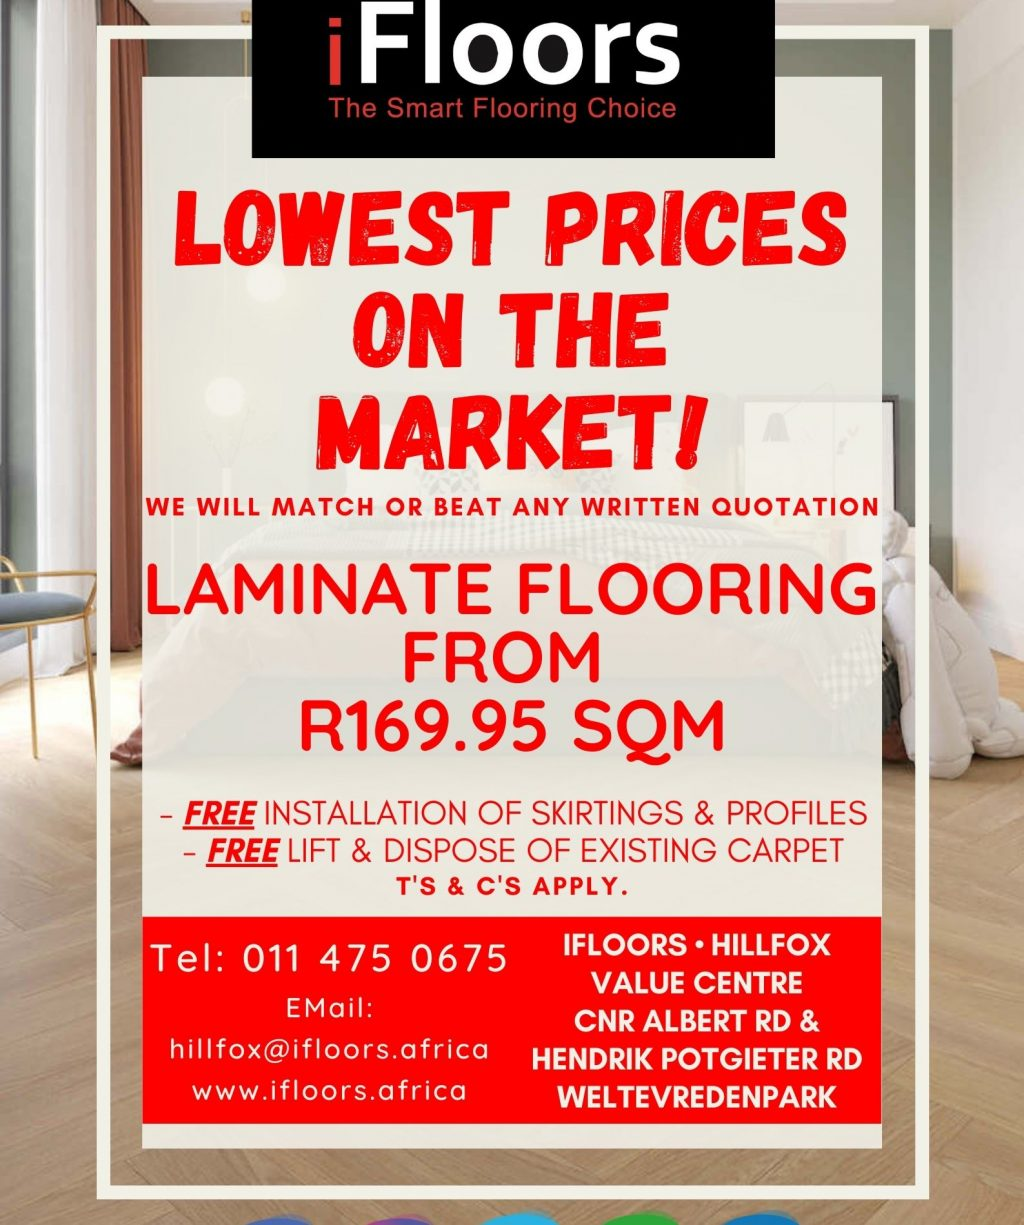 iFloors Lowest Prices!!!! pic jpeg